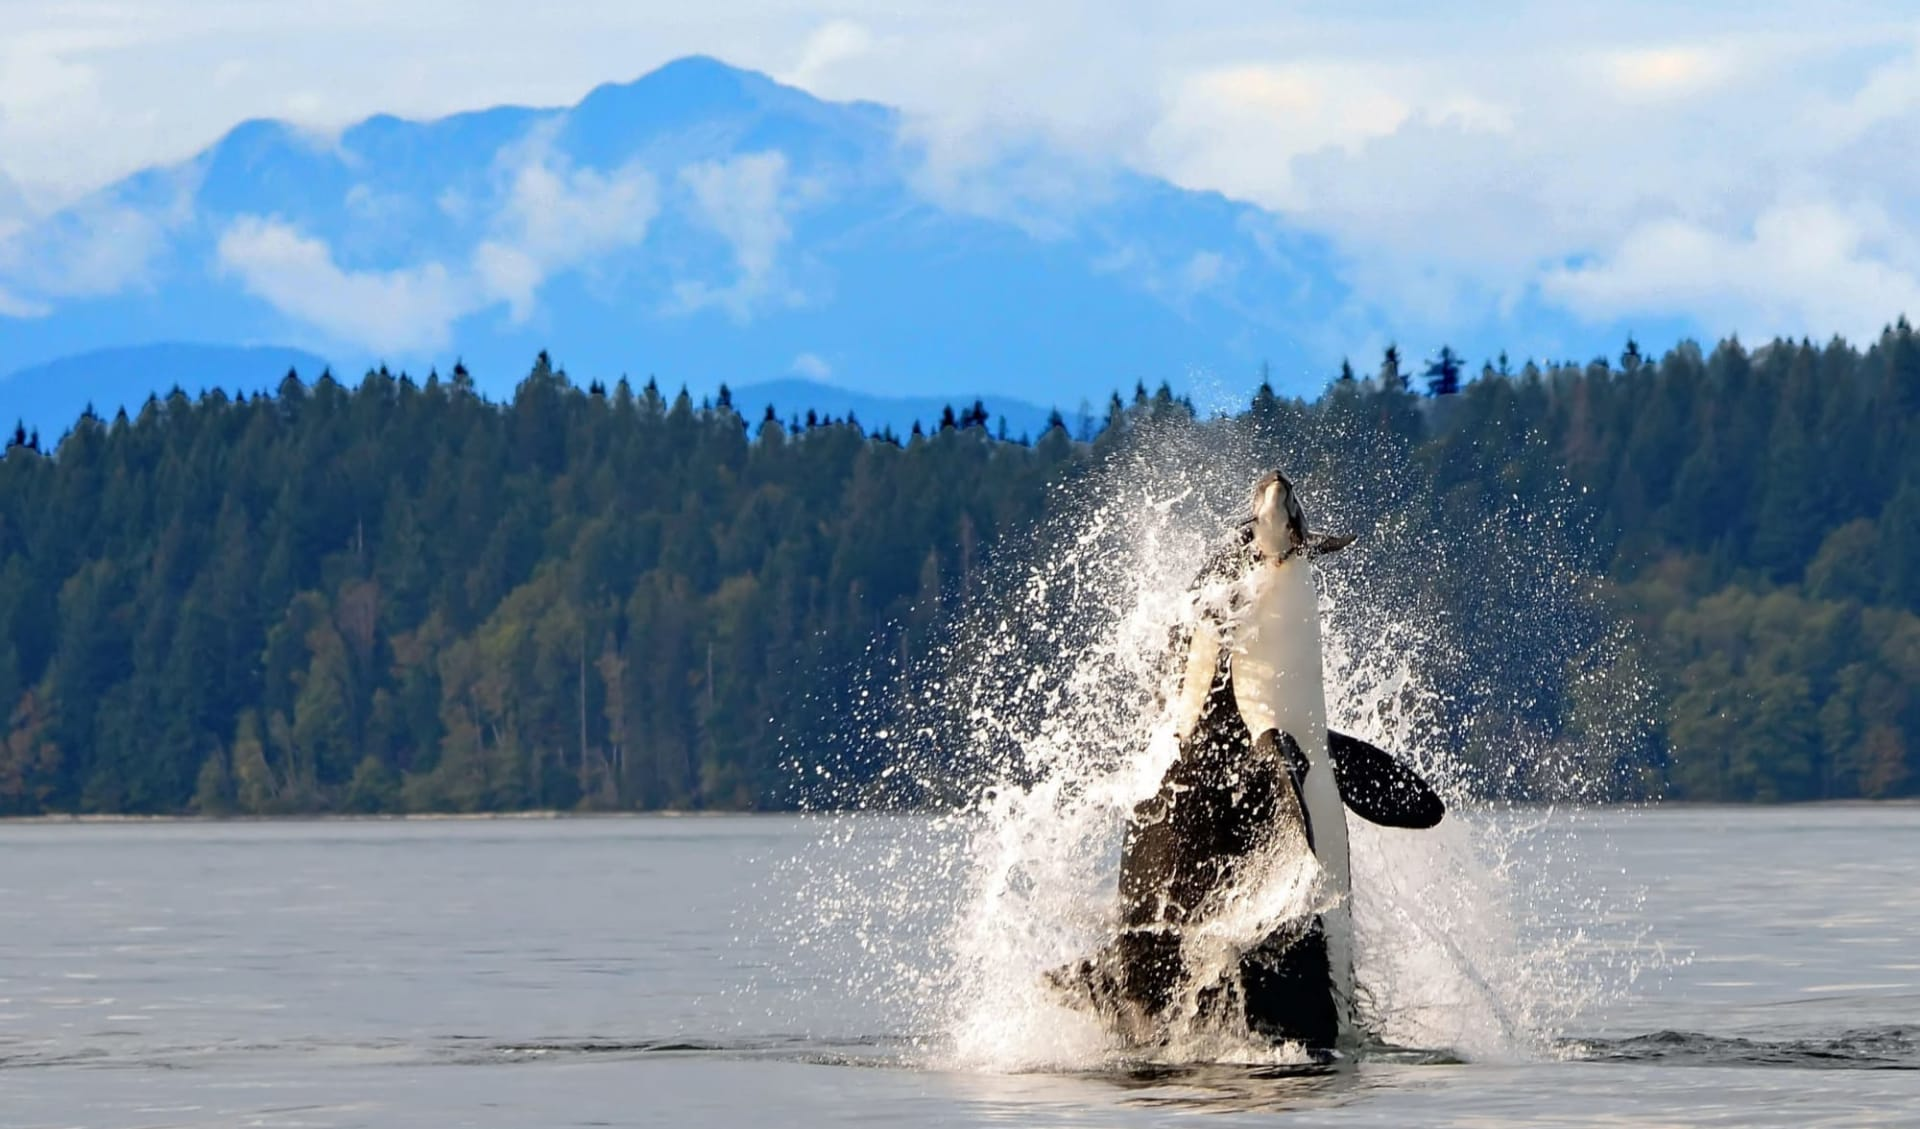 Höhepunkte Westkanadas ab Vancouver: Kanada - Campbell River B.C - Orca